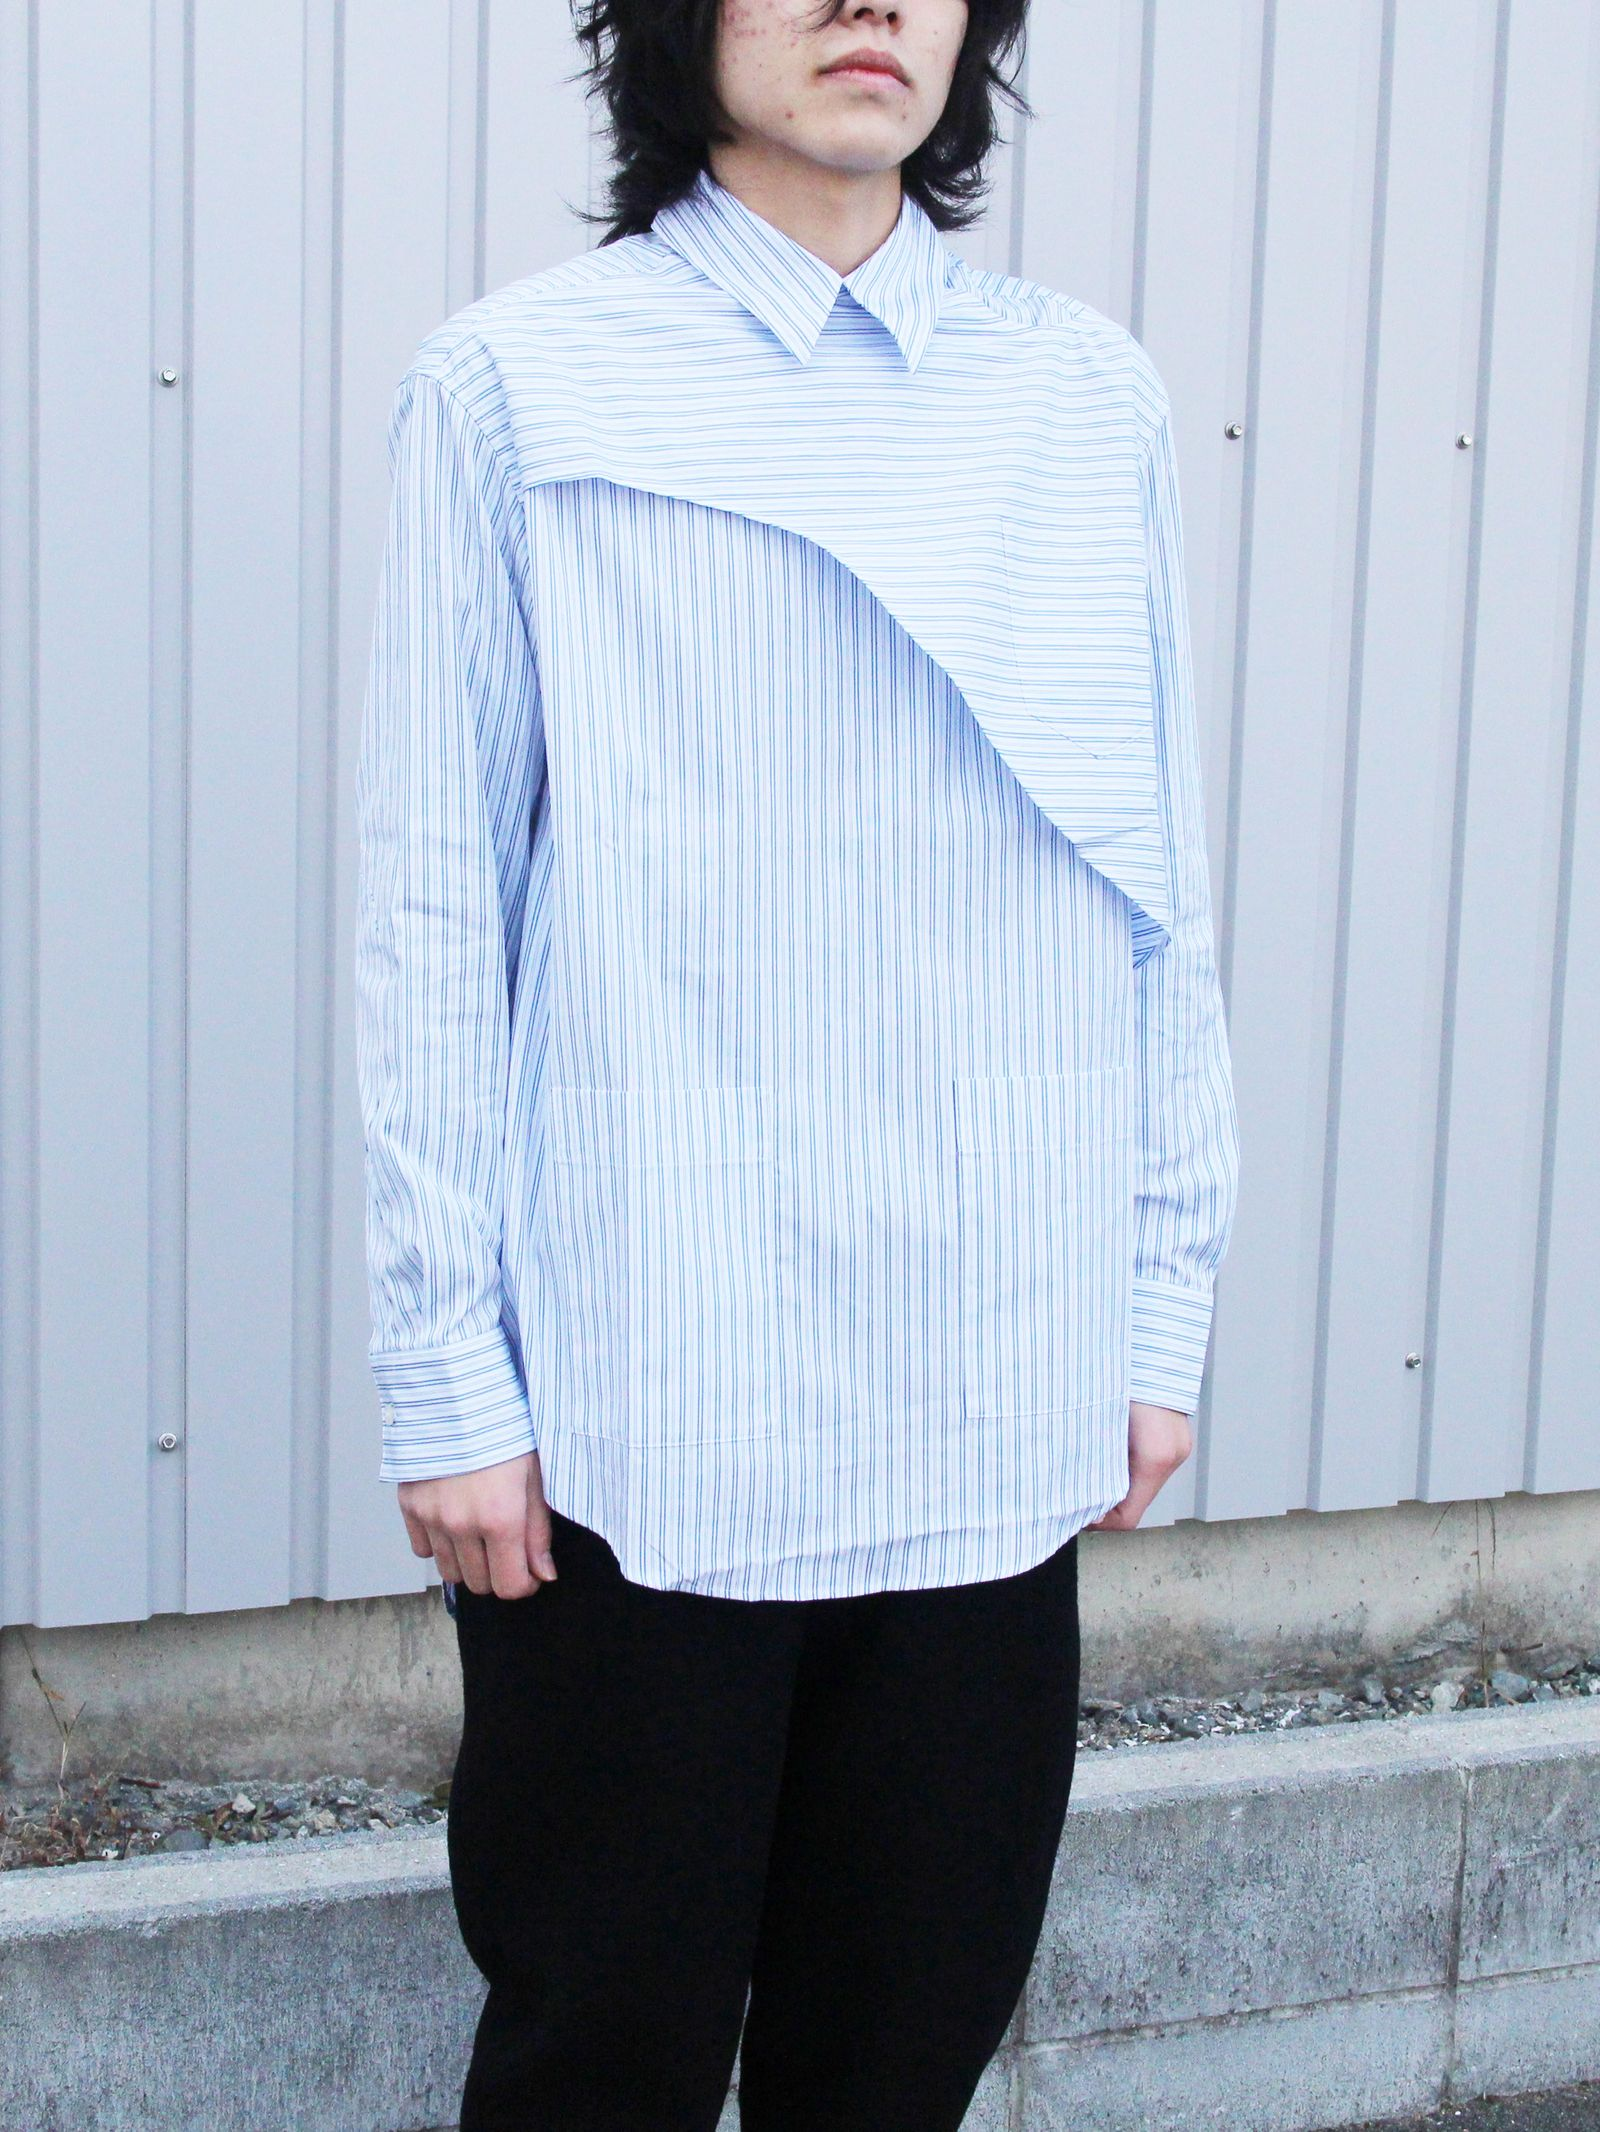 YUKI TORII デニム調スーツ制服|事務服・受付制服|事務服・受付